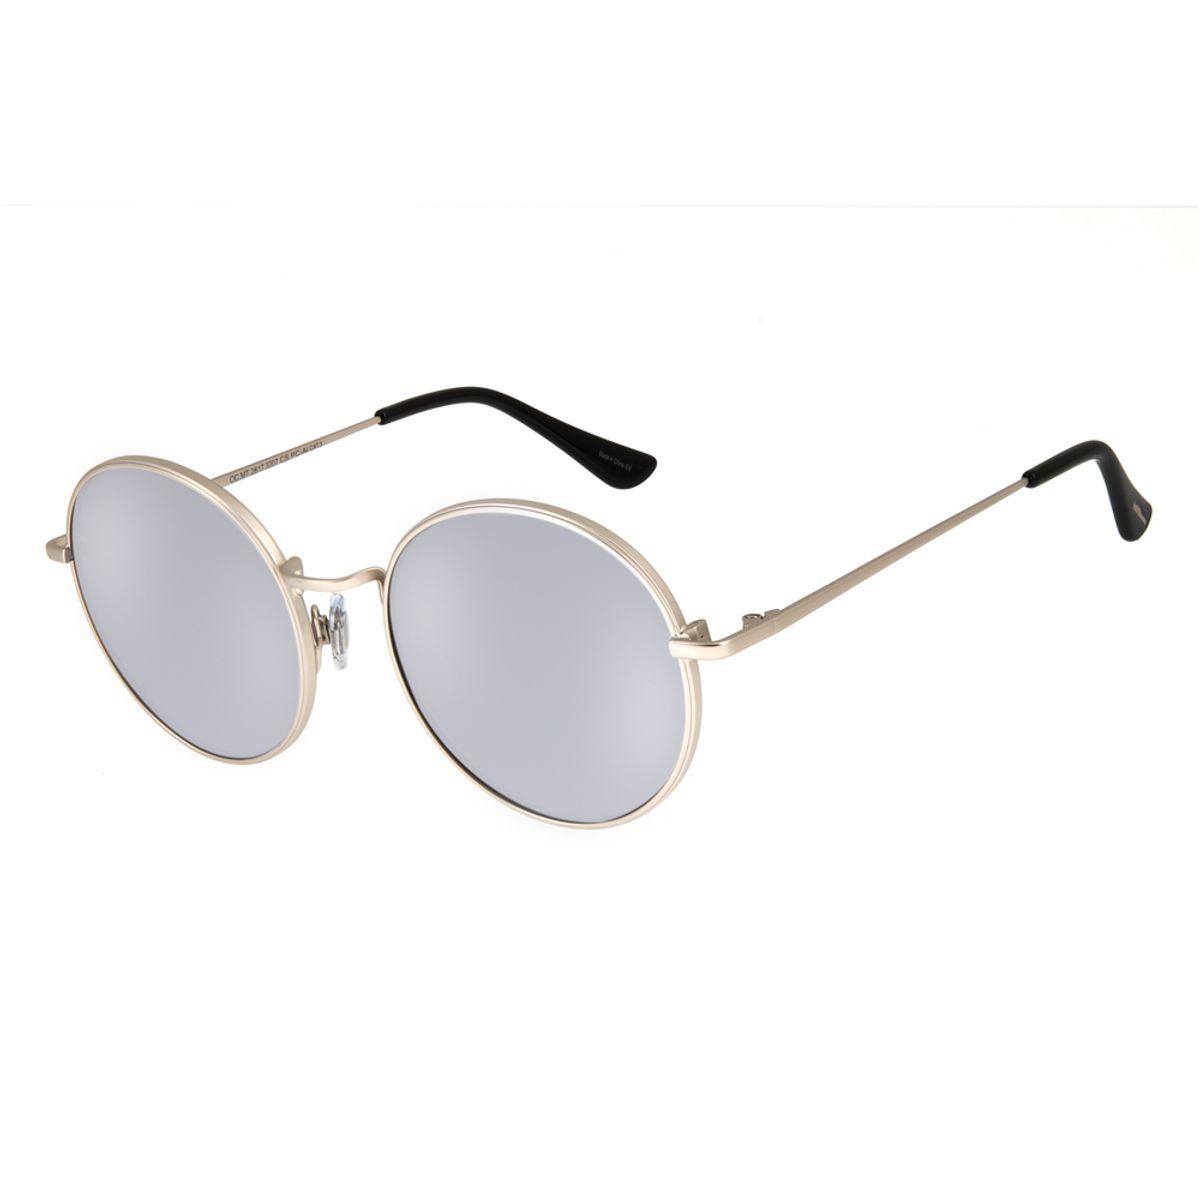 e7a431019 Óculos de Sol Chilli Beans Unissex Metal Redondo Prata 2617 - Chilli ...